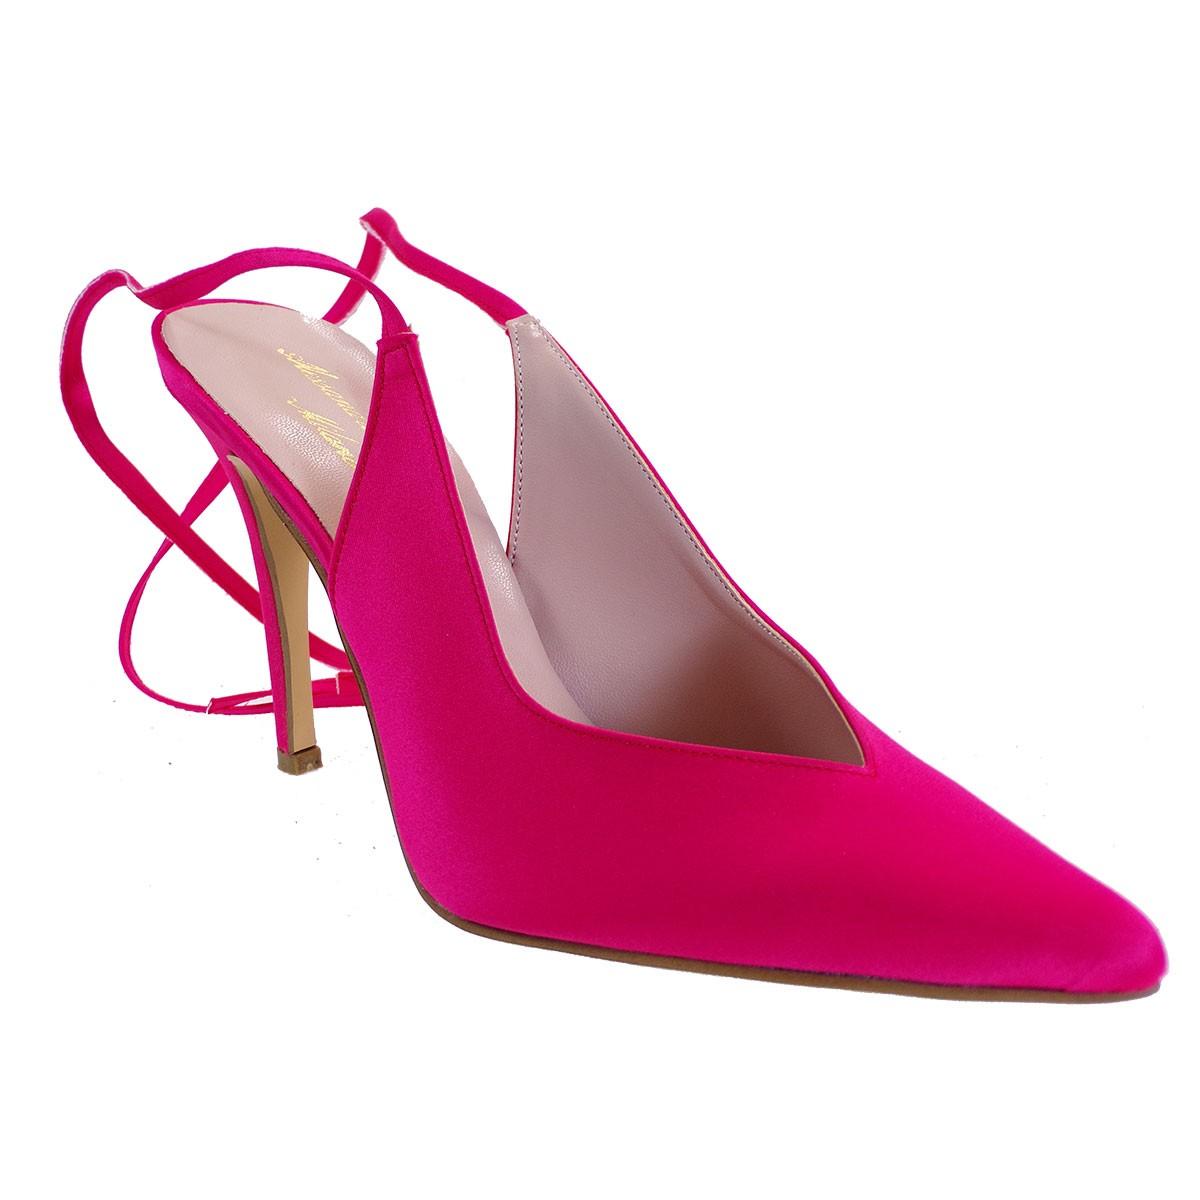 Alessandra Paggioti Γυναικεία Παπούτσια Γόβες 89685 Φούξια Σατέν